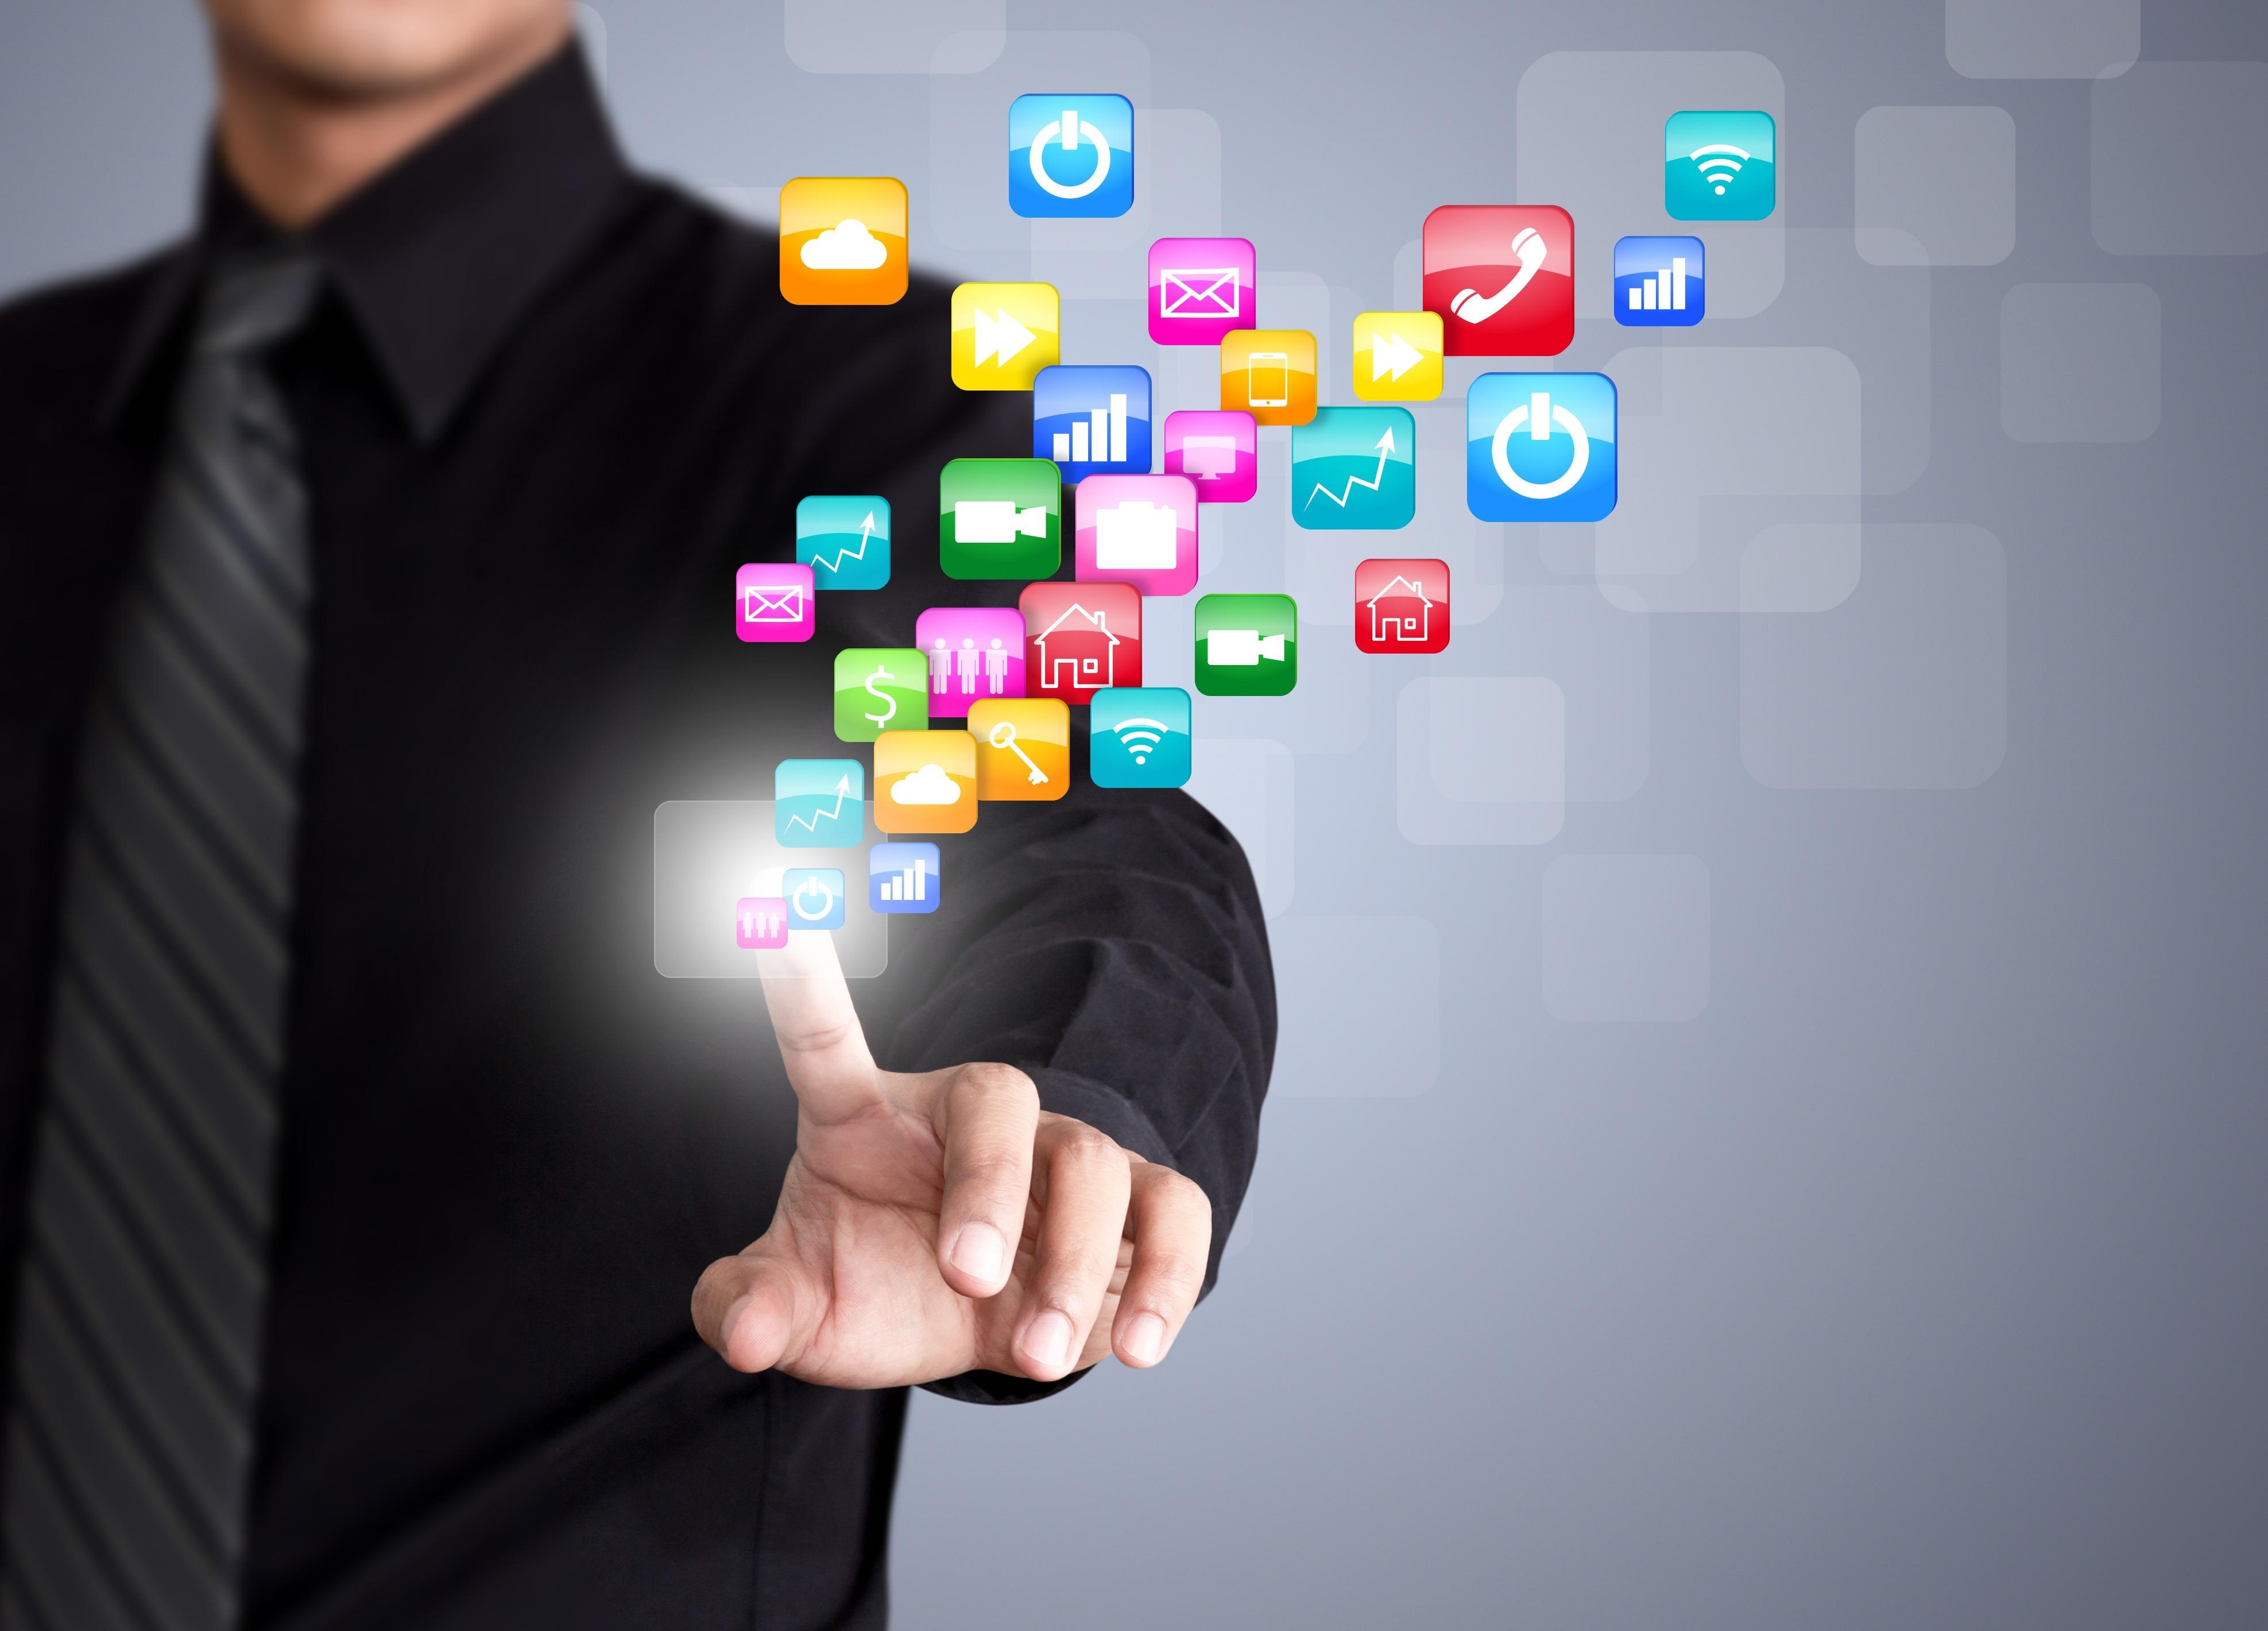 5 Reasons Why You Should Embrace Social Media Minimalism